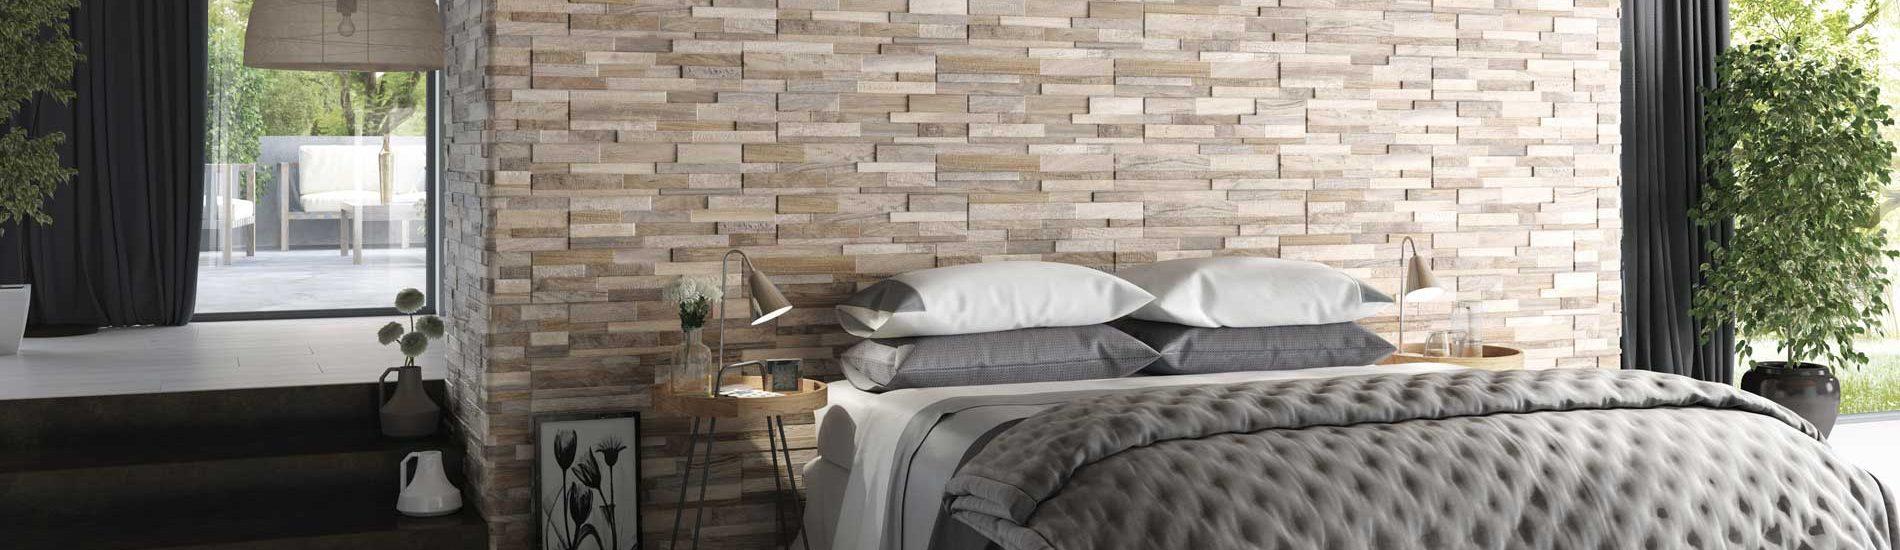 banner-Wall Art 3D Wood Look Ledger Wall Tile